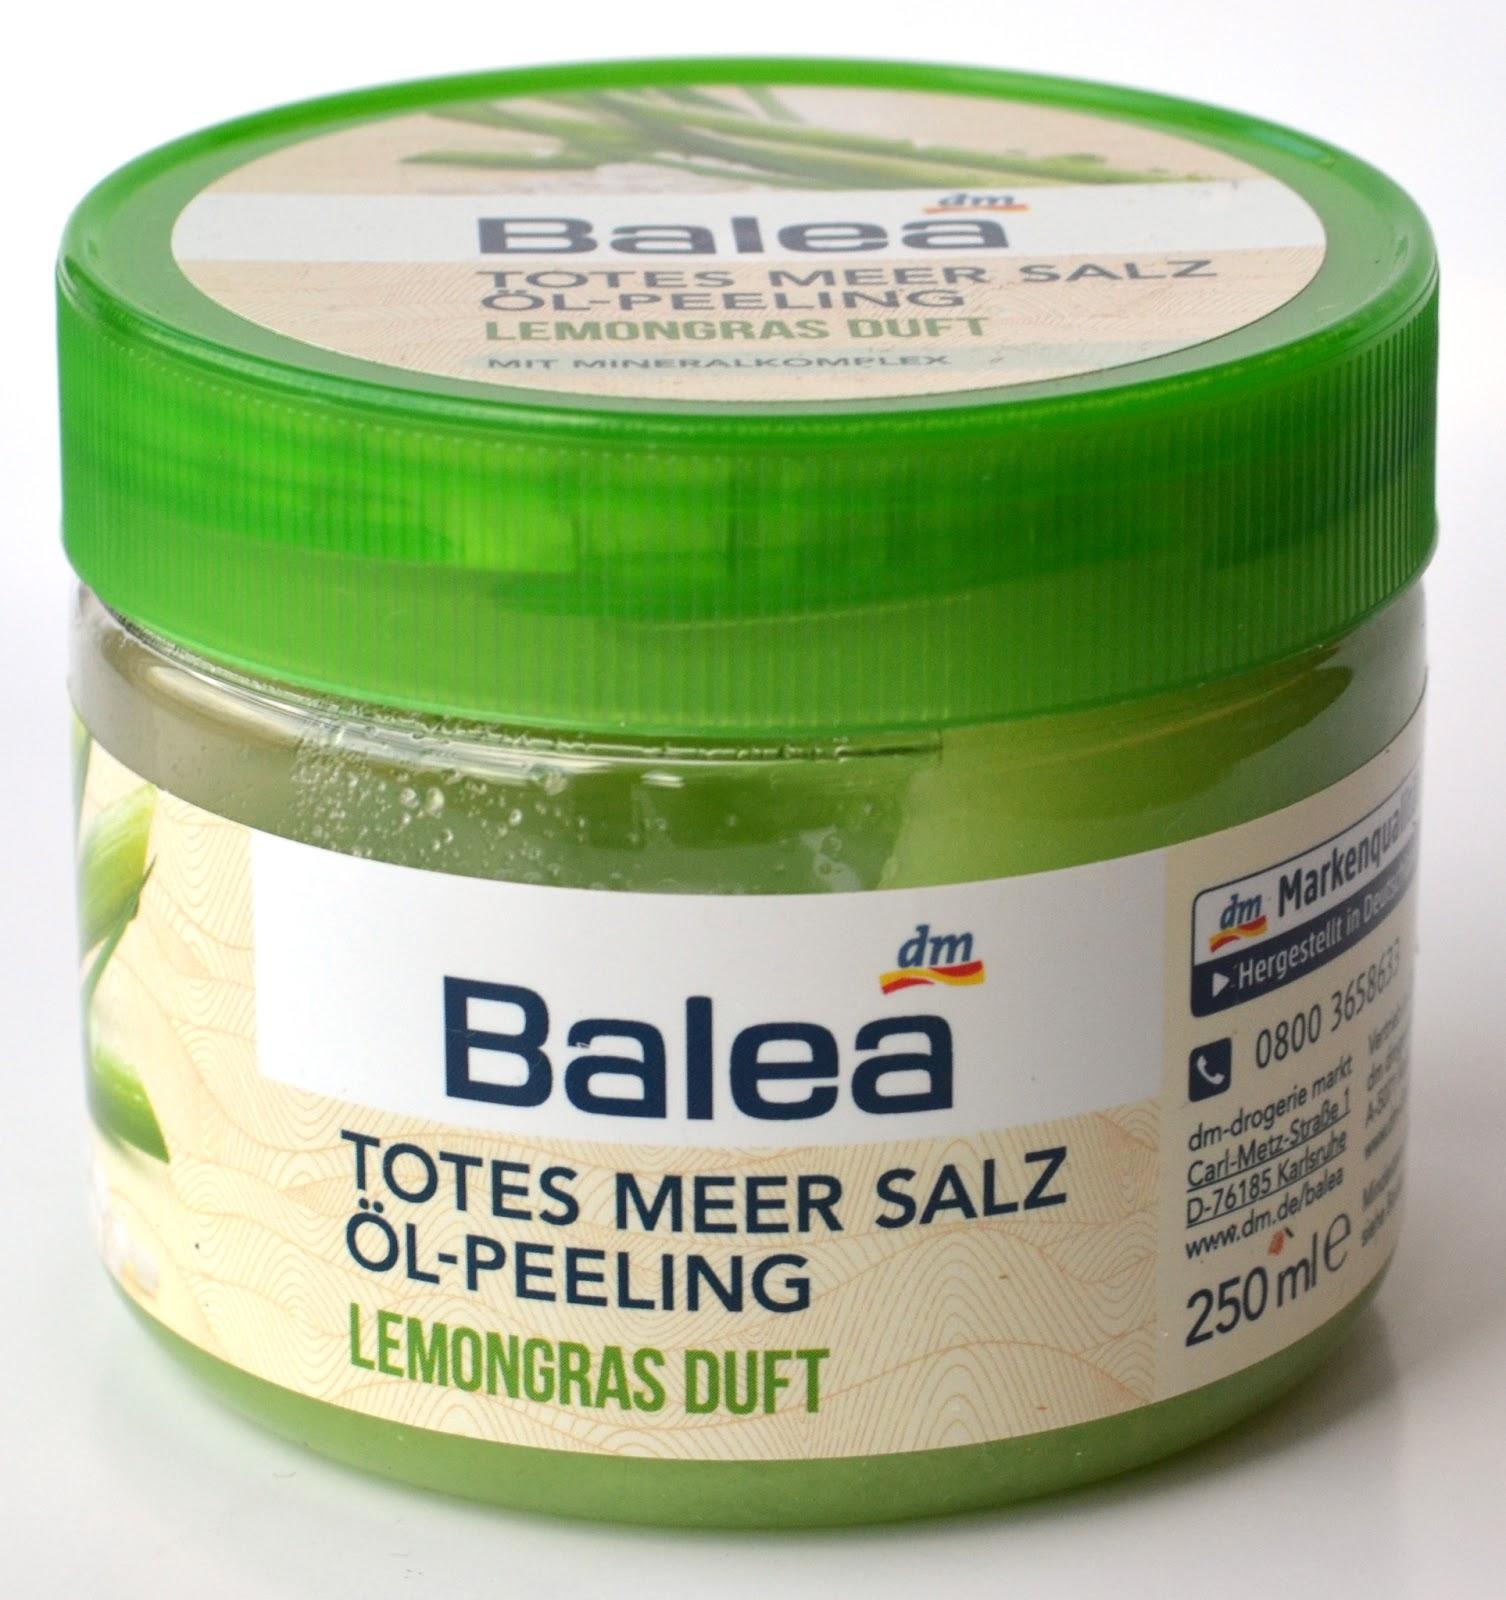 http://lenas-sofa.blogspot.de/2014/05/balea-totes-meer-salz-ol-peeling.html